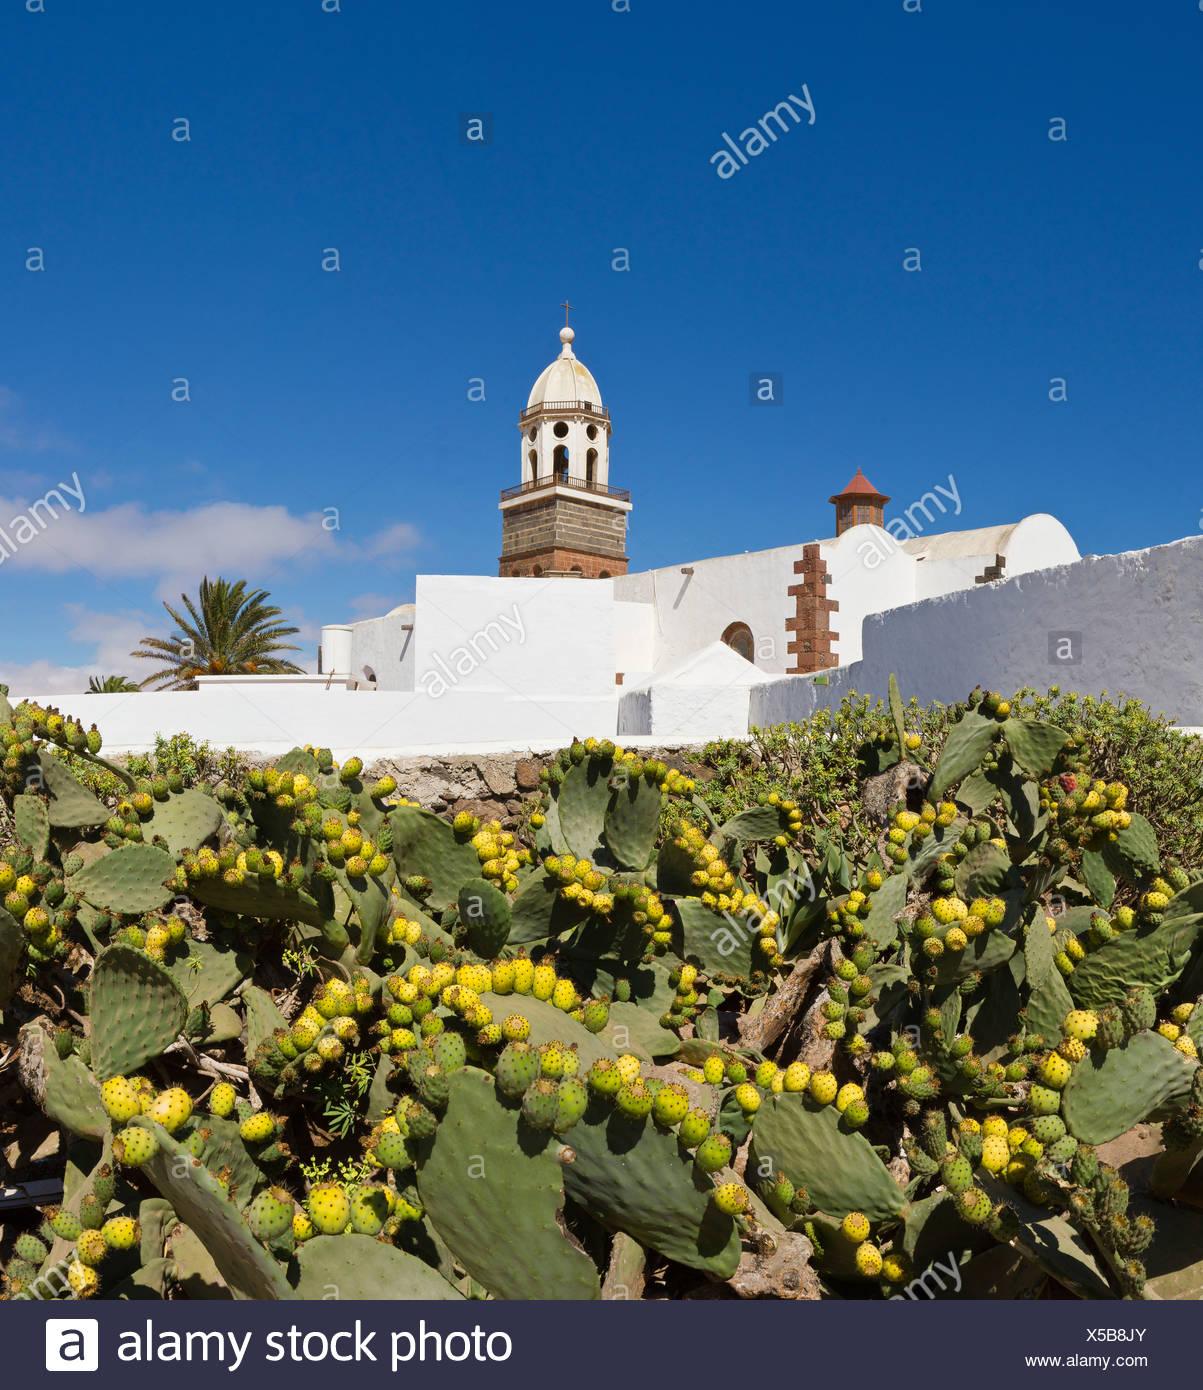 Spain, Lanzarote, Teguise, Iglesia de Guidalupe, church, monastery, summer, Canary Islands, - Stock Image